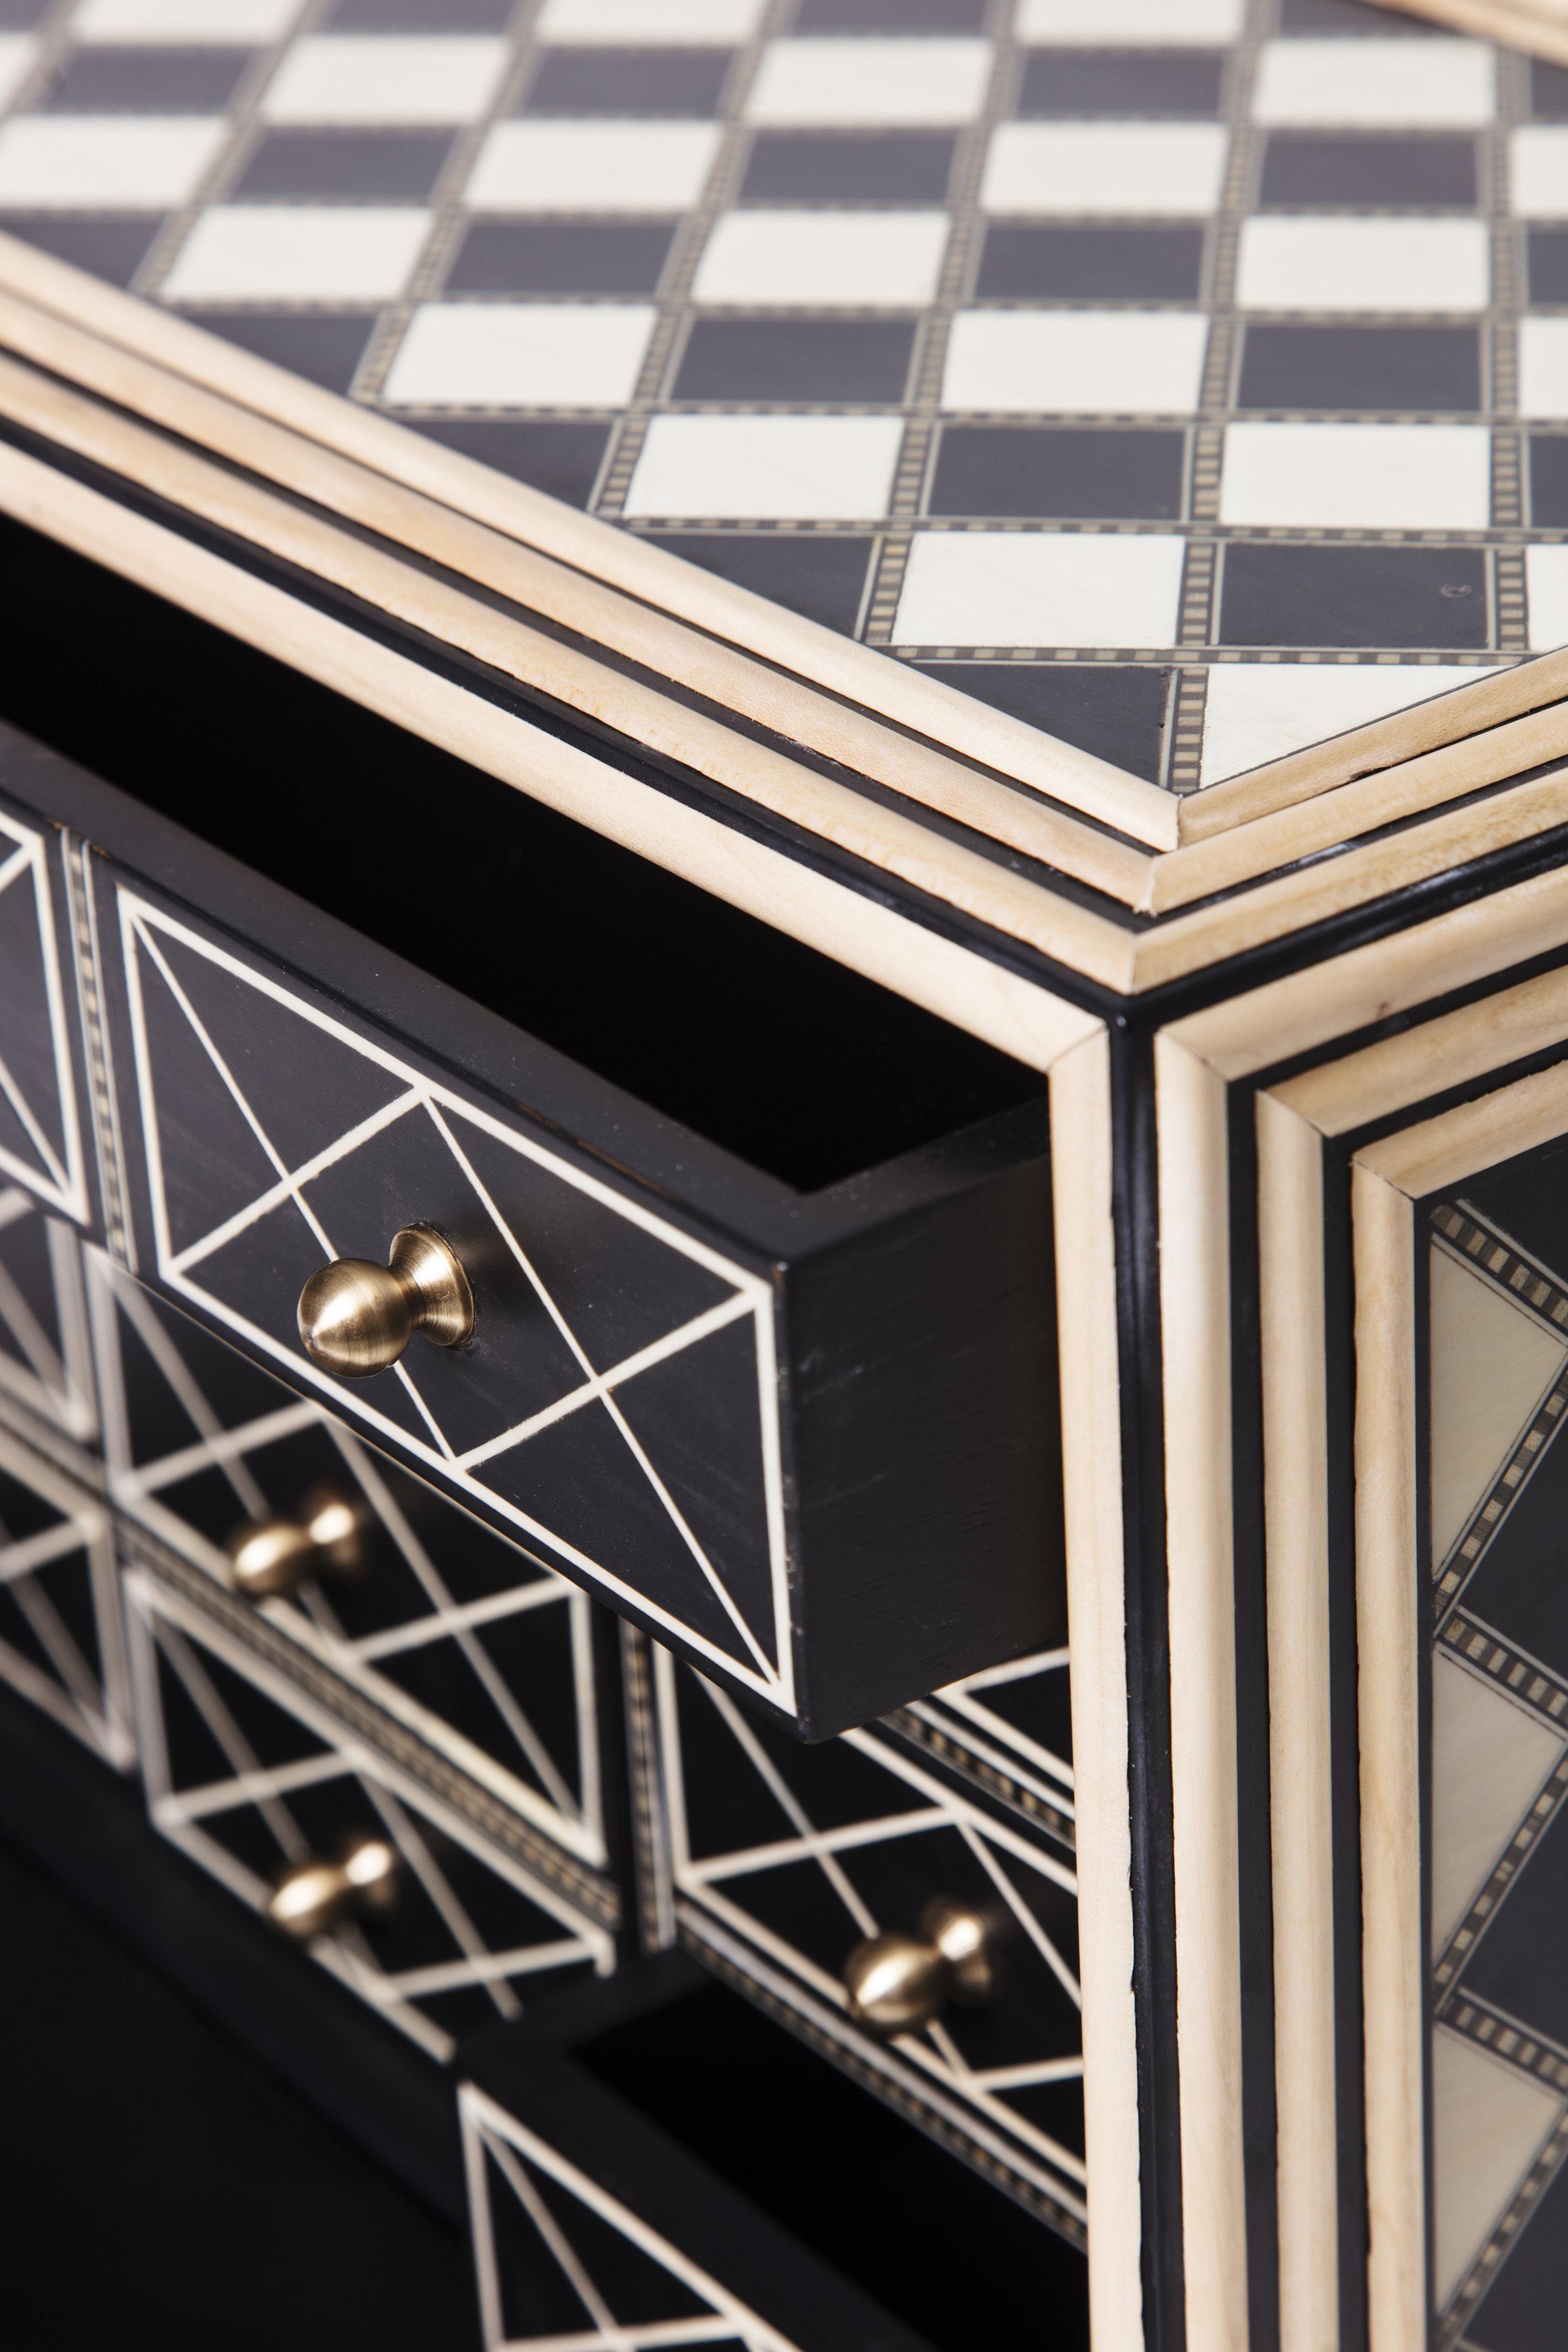 Sibylle Tarazi_Curiosity Cabinets_Oh Boy!_Detail 2_2017.jpg